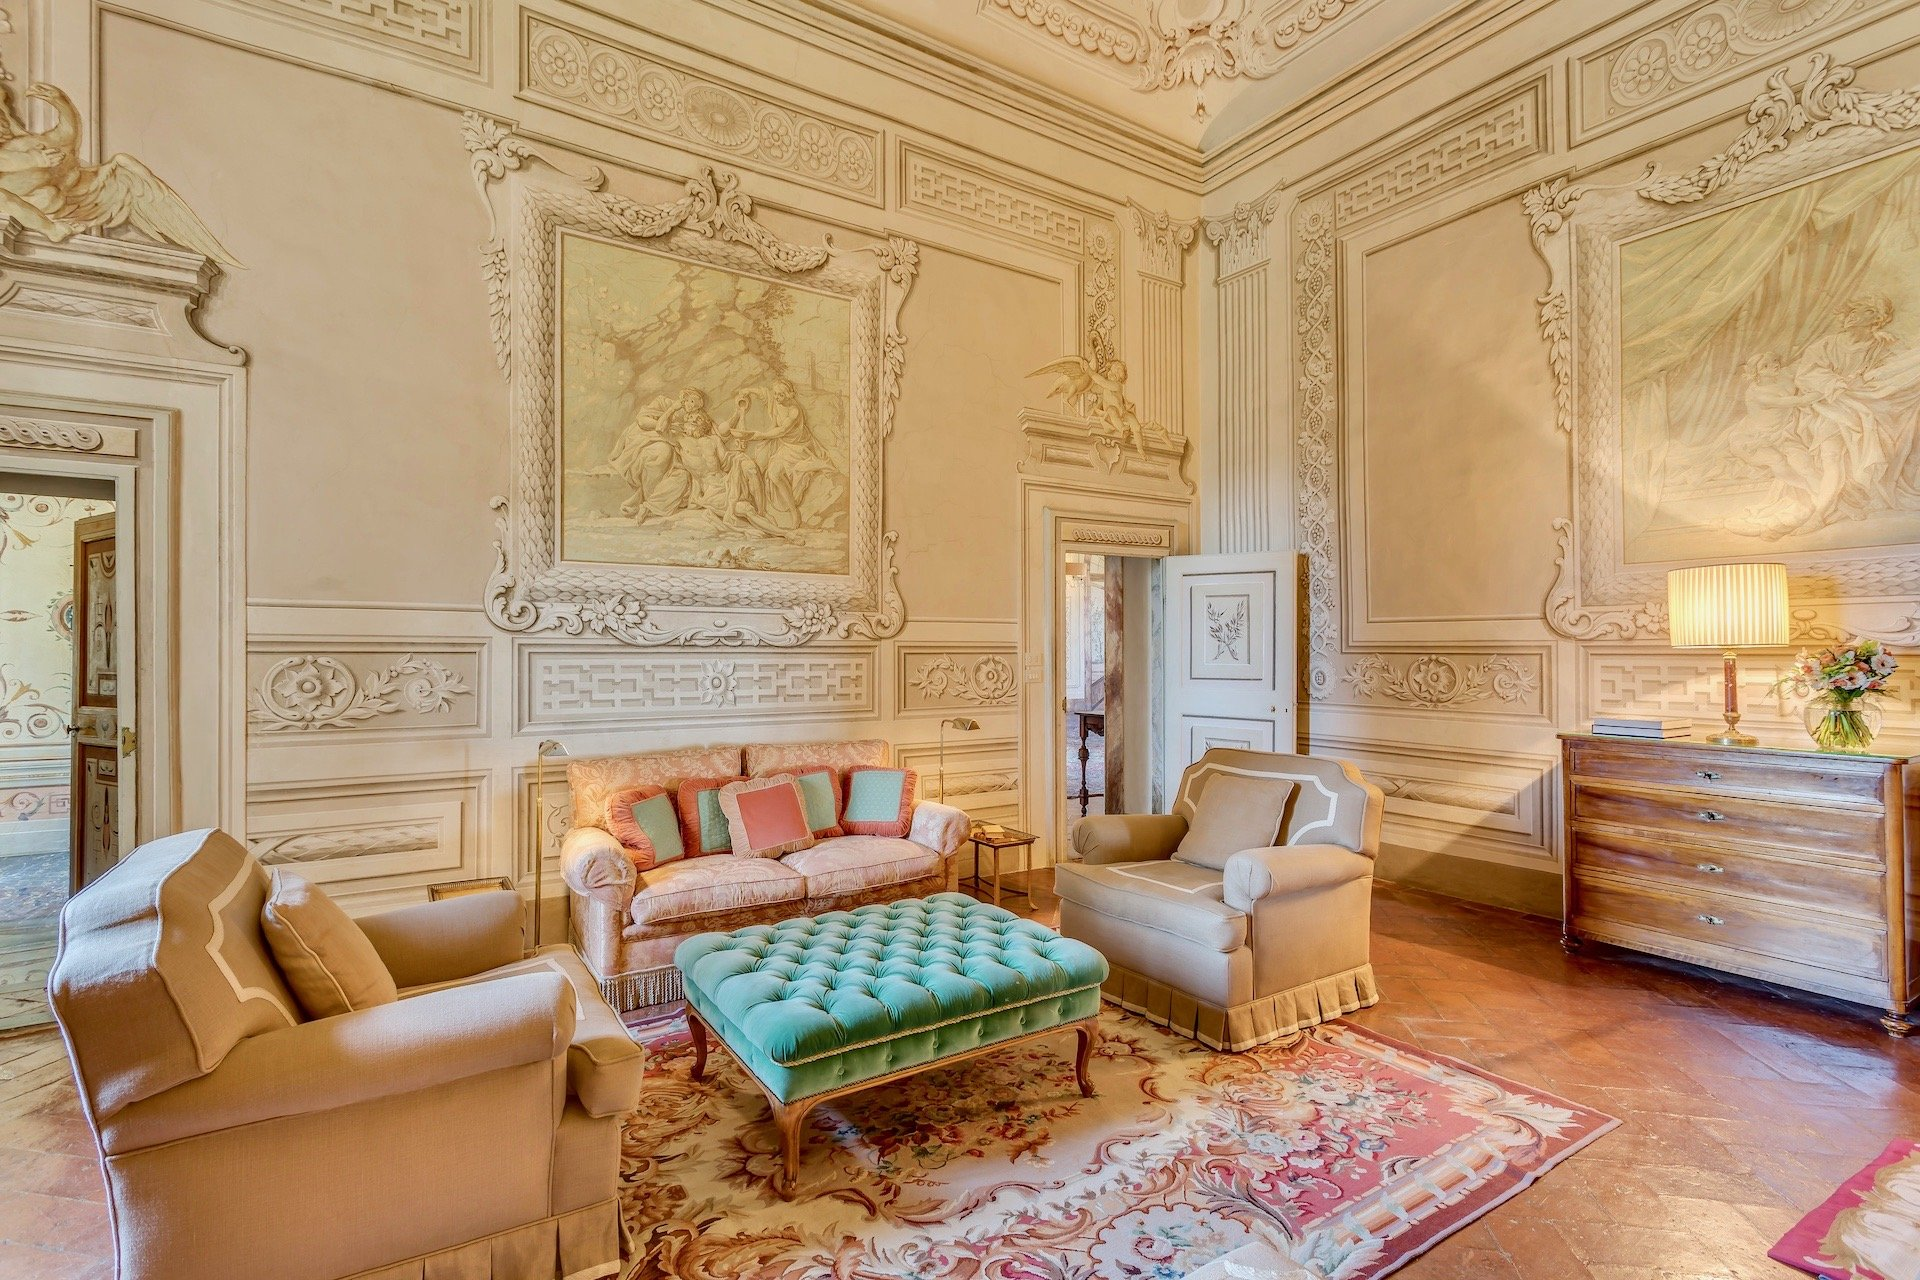 7.The Baldacchino Suite